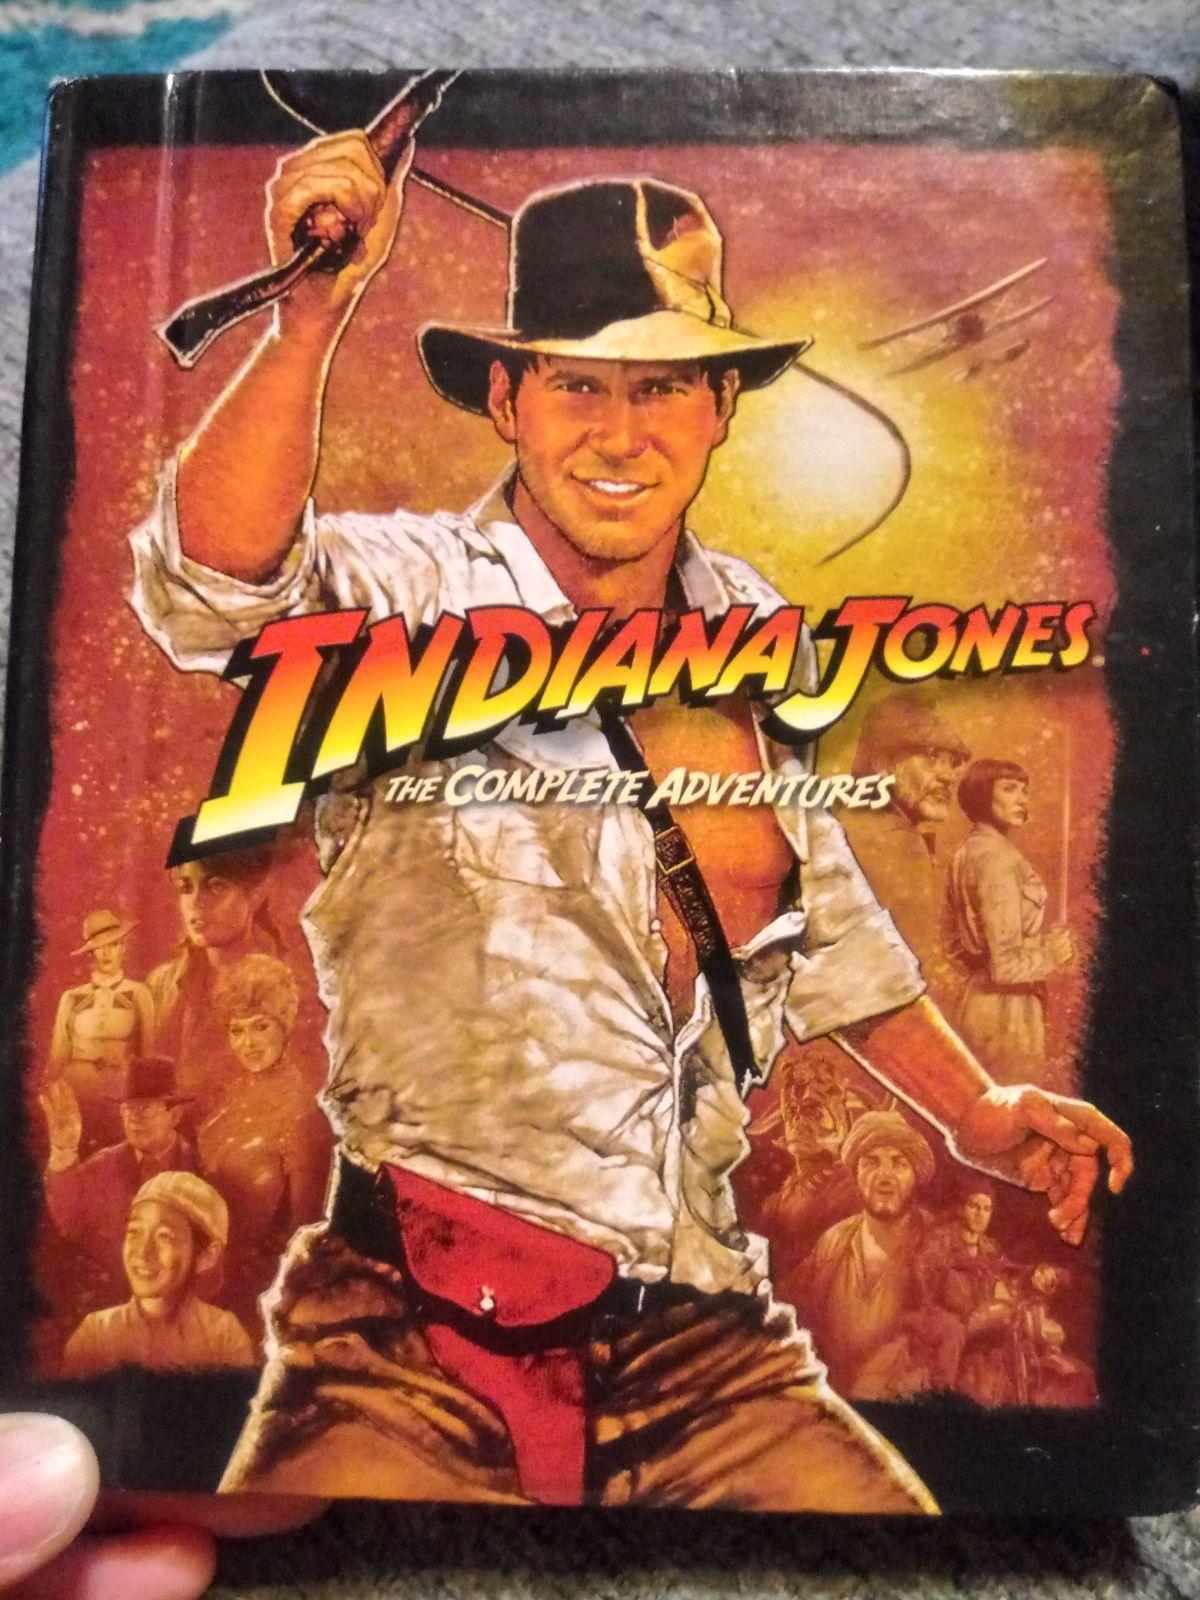 Indiana jones first 2 blu ray movies in 2020 indiana